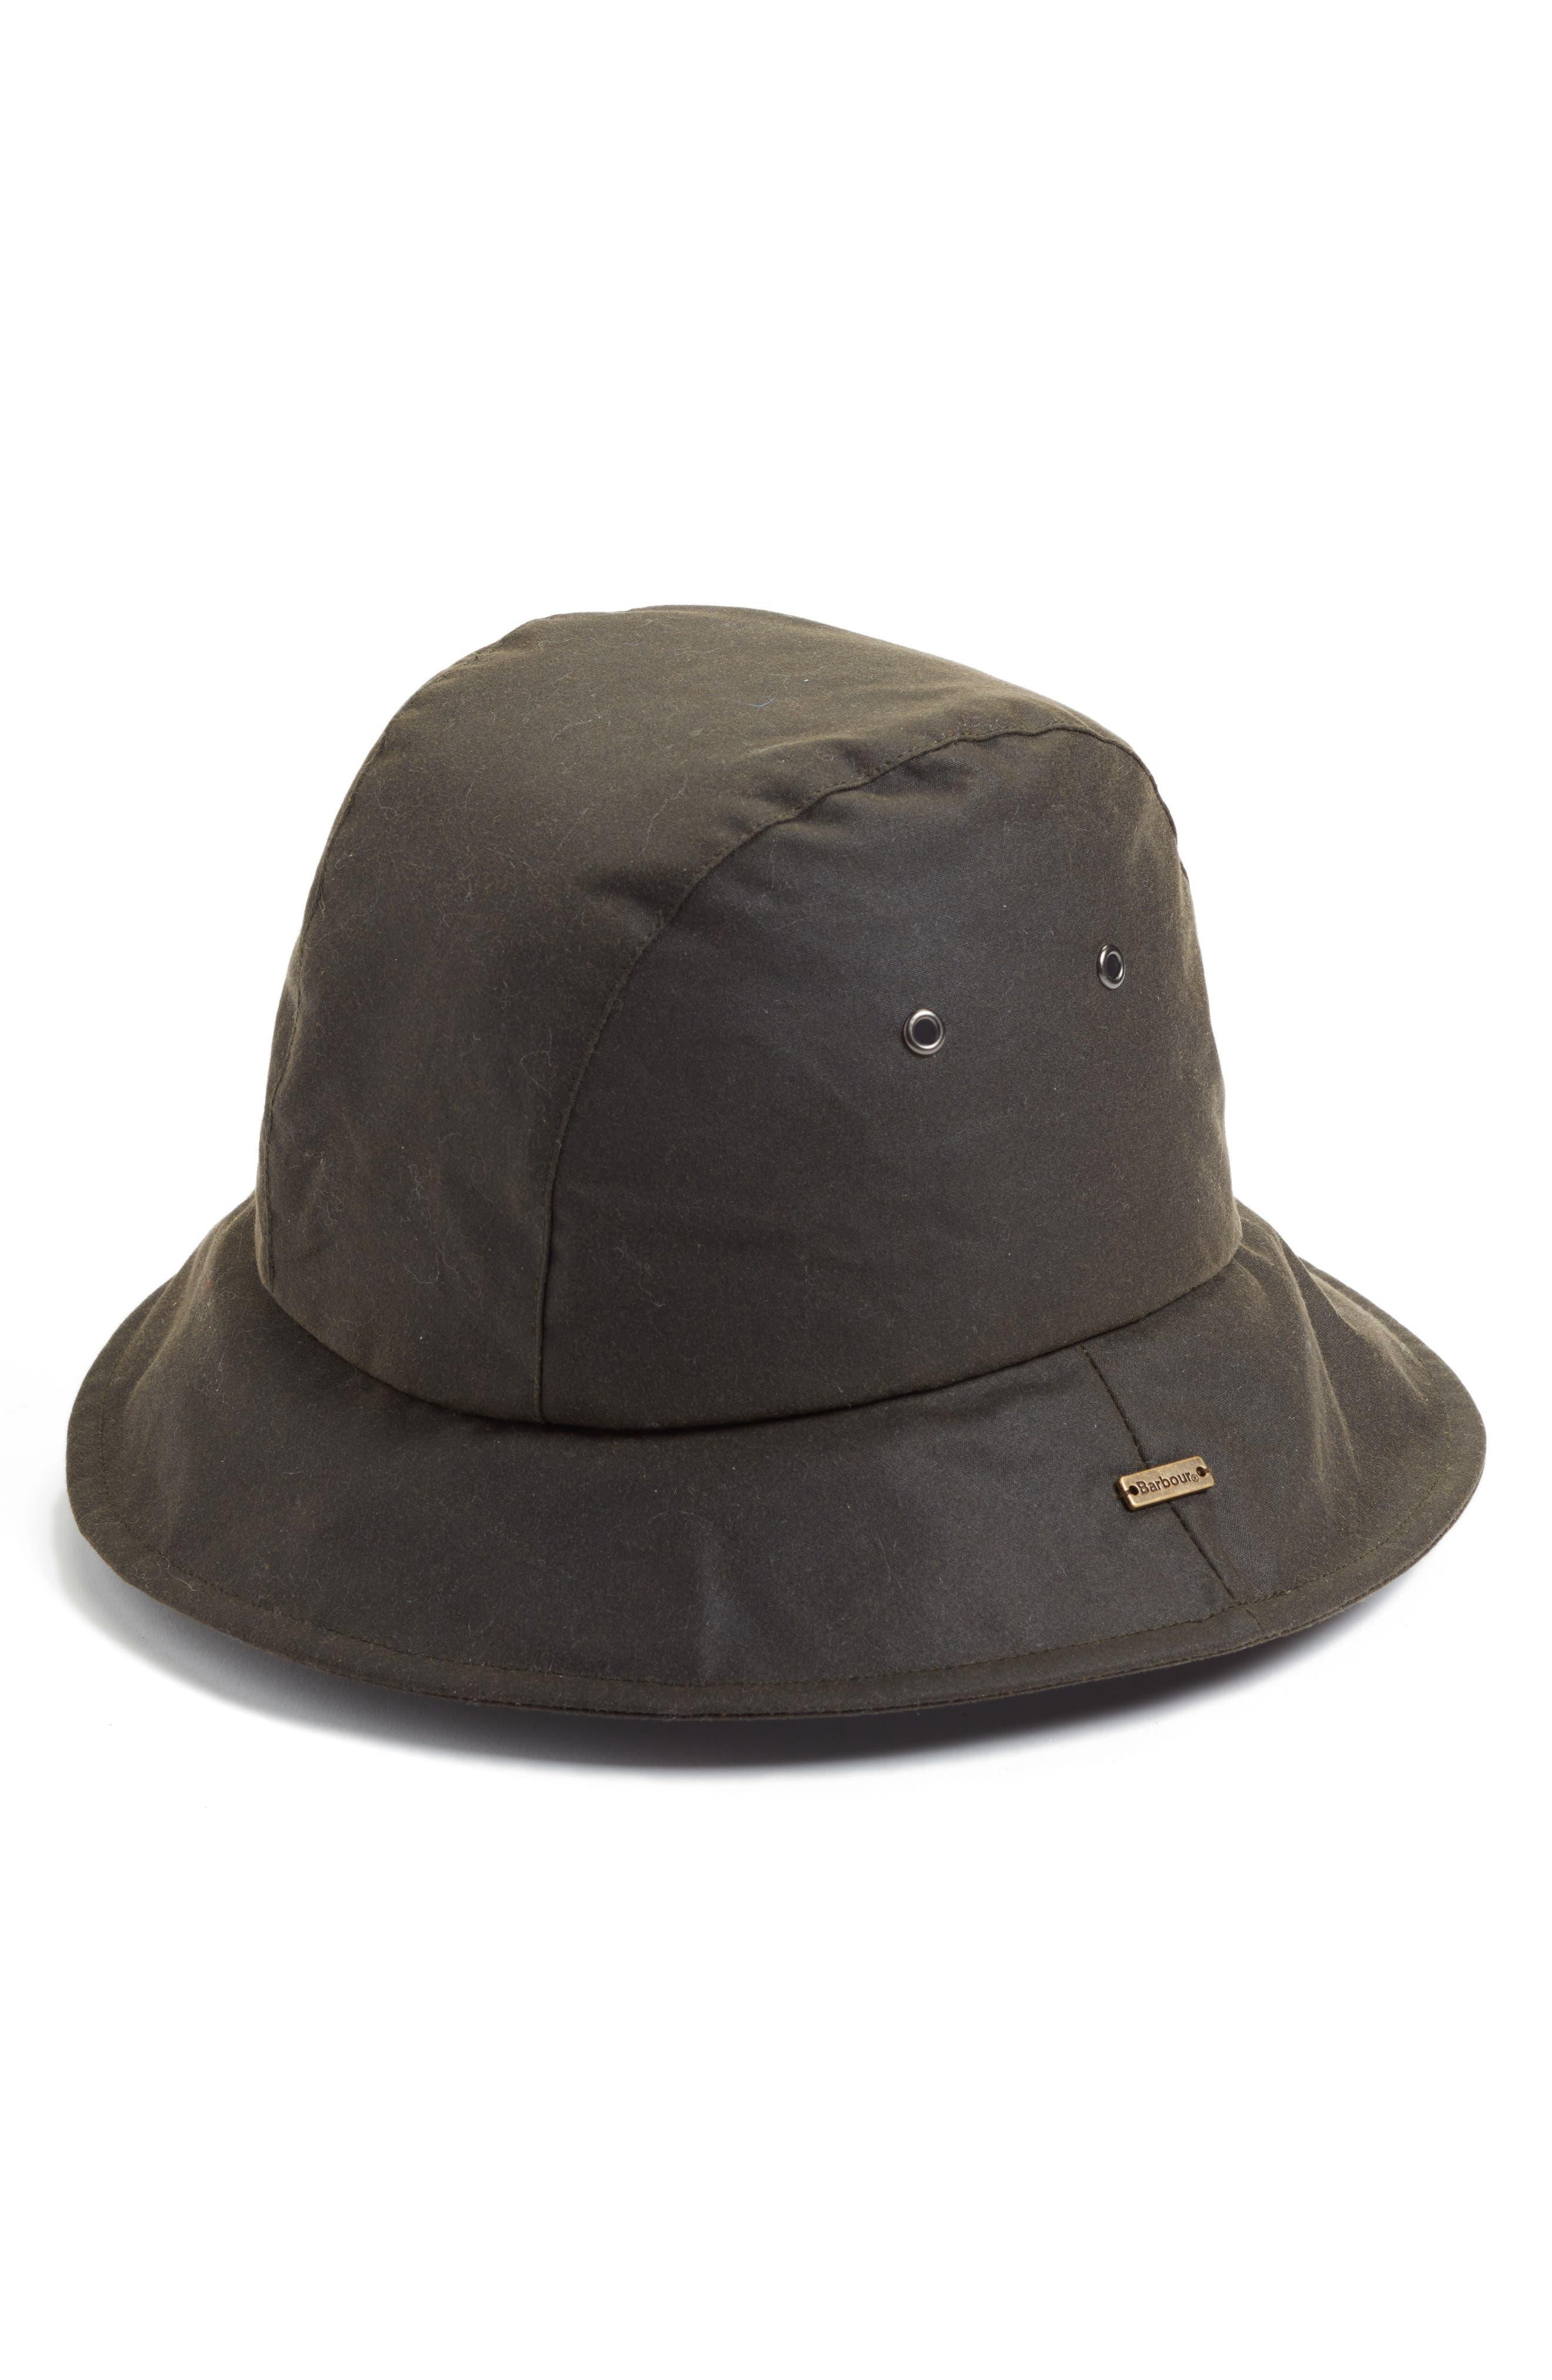 Alternate Image 1 Selected - Barbou Sou Wester Bucket Hat